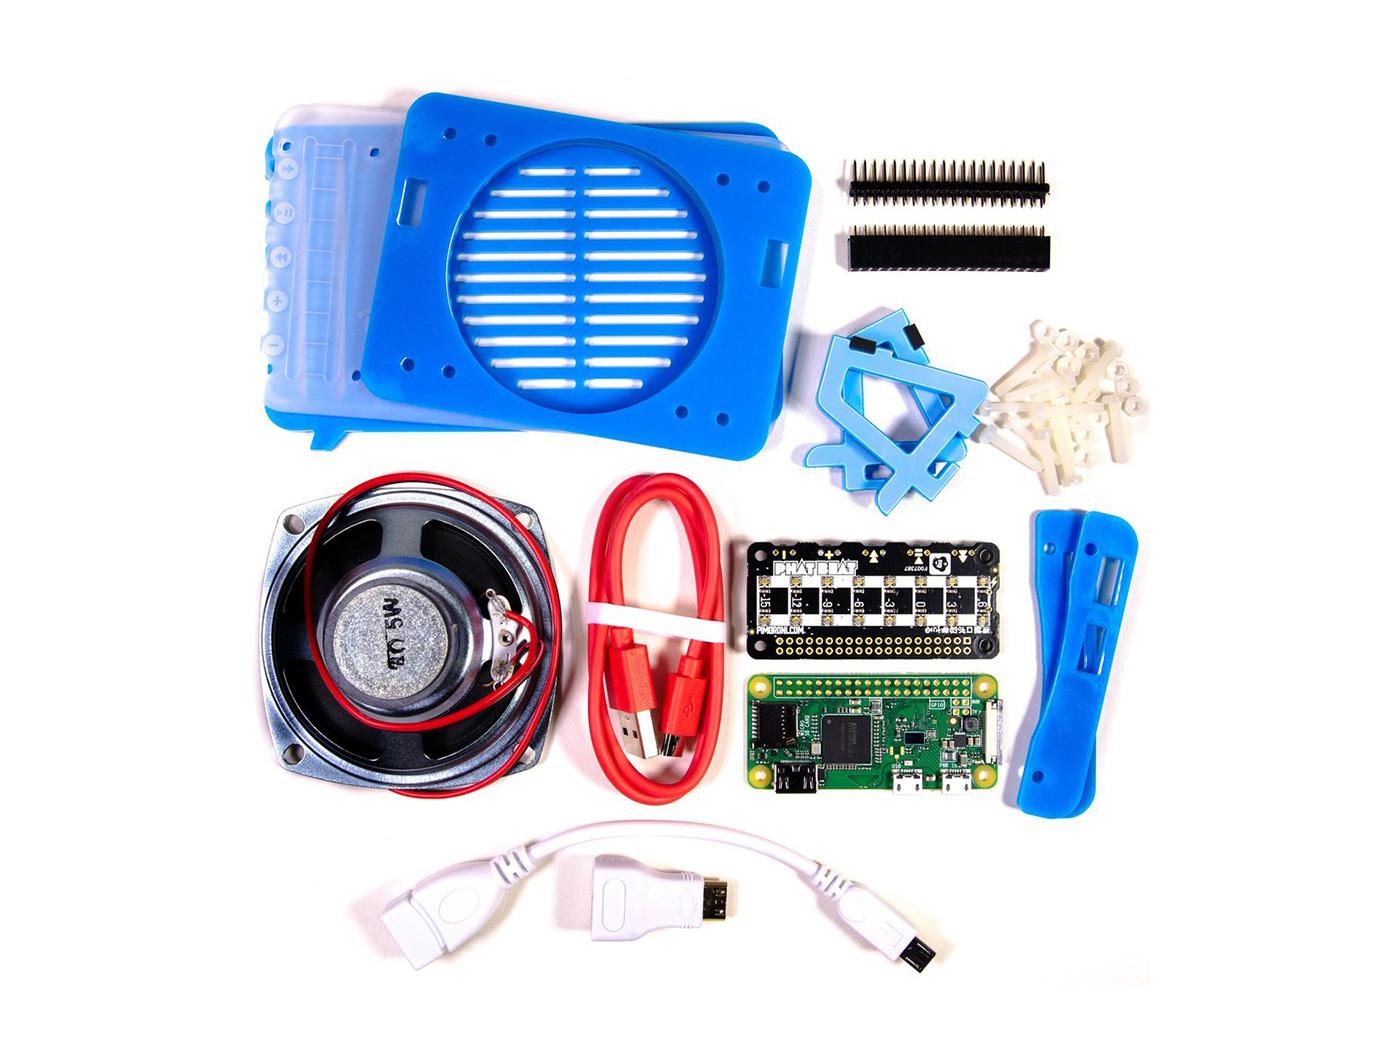 Pimoroni Pirate Radio - Pi Zero W Project Kit-Build your very ow